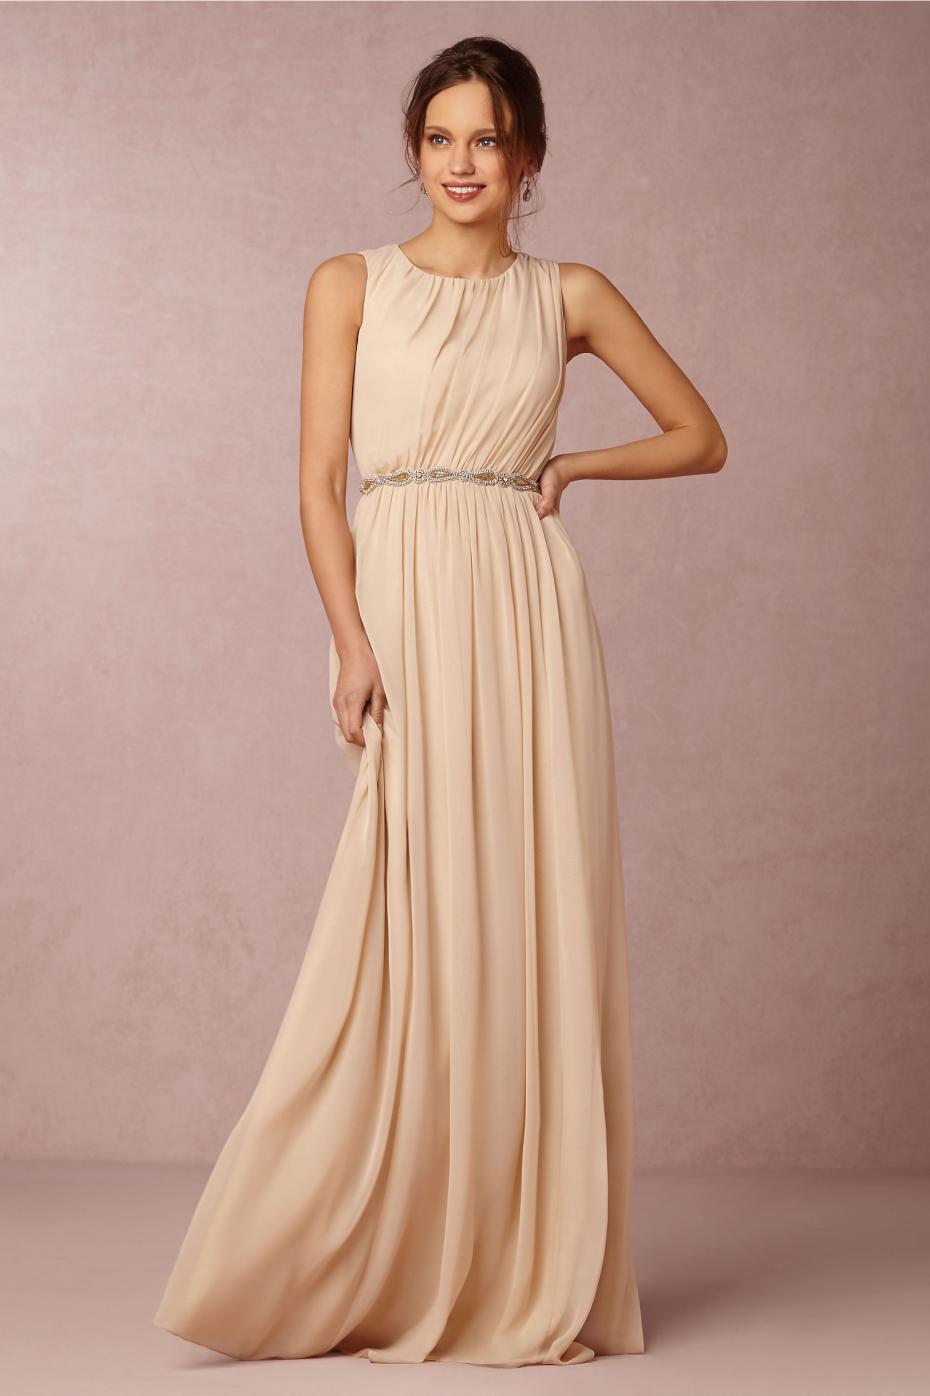 Images of Formal Long Dresses For Juniors - Reikian